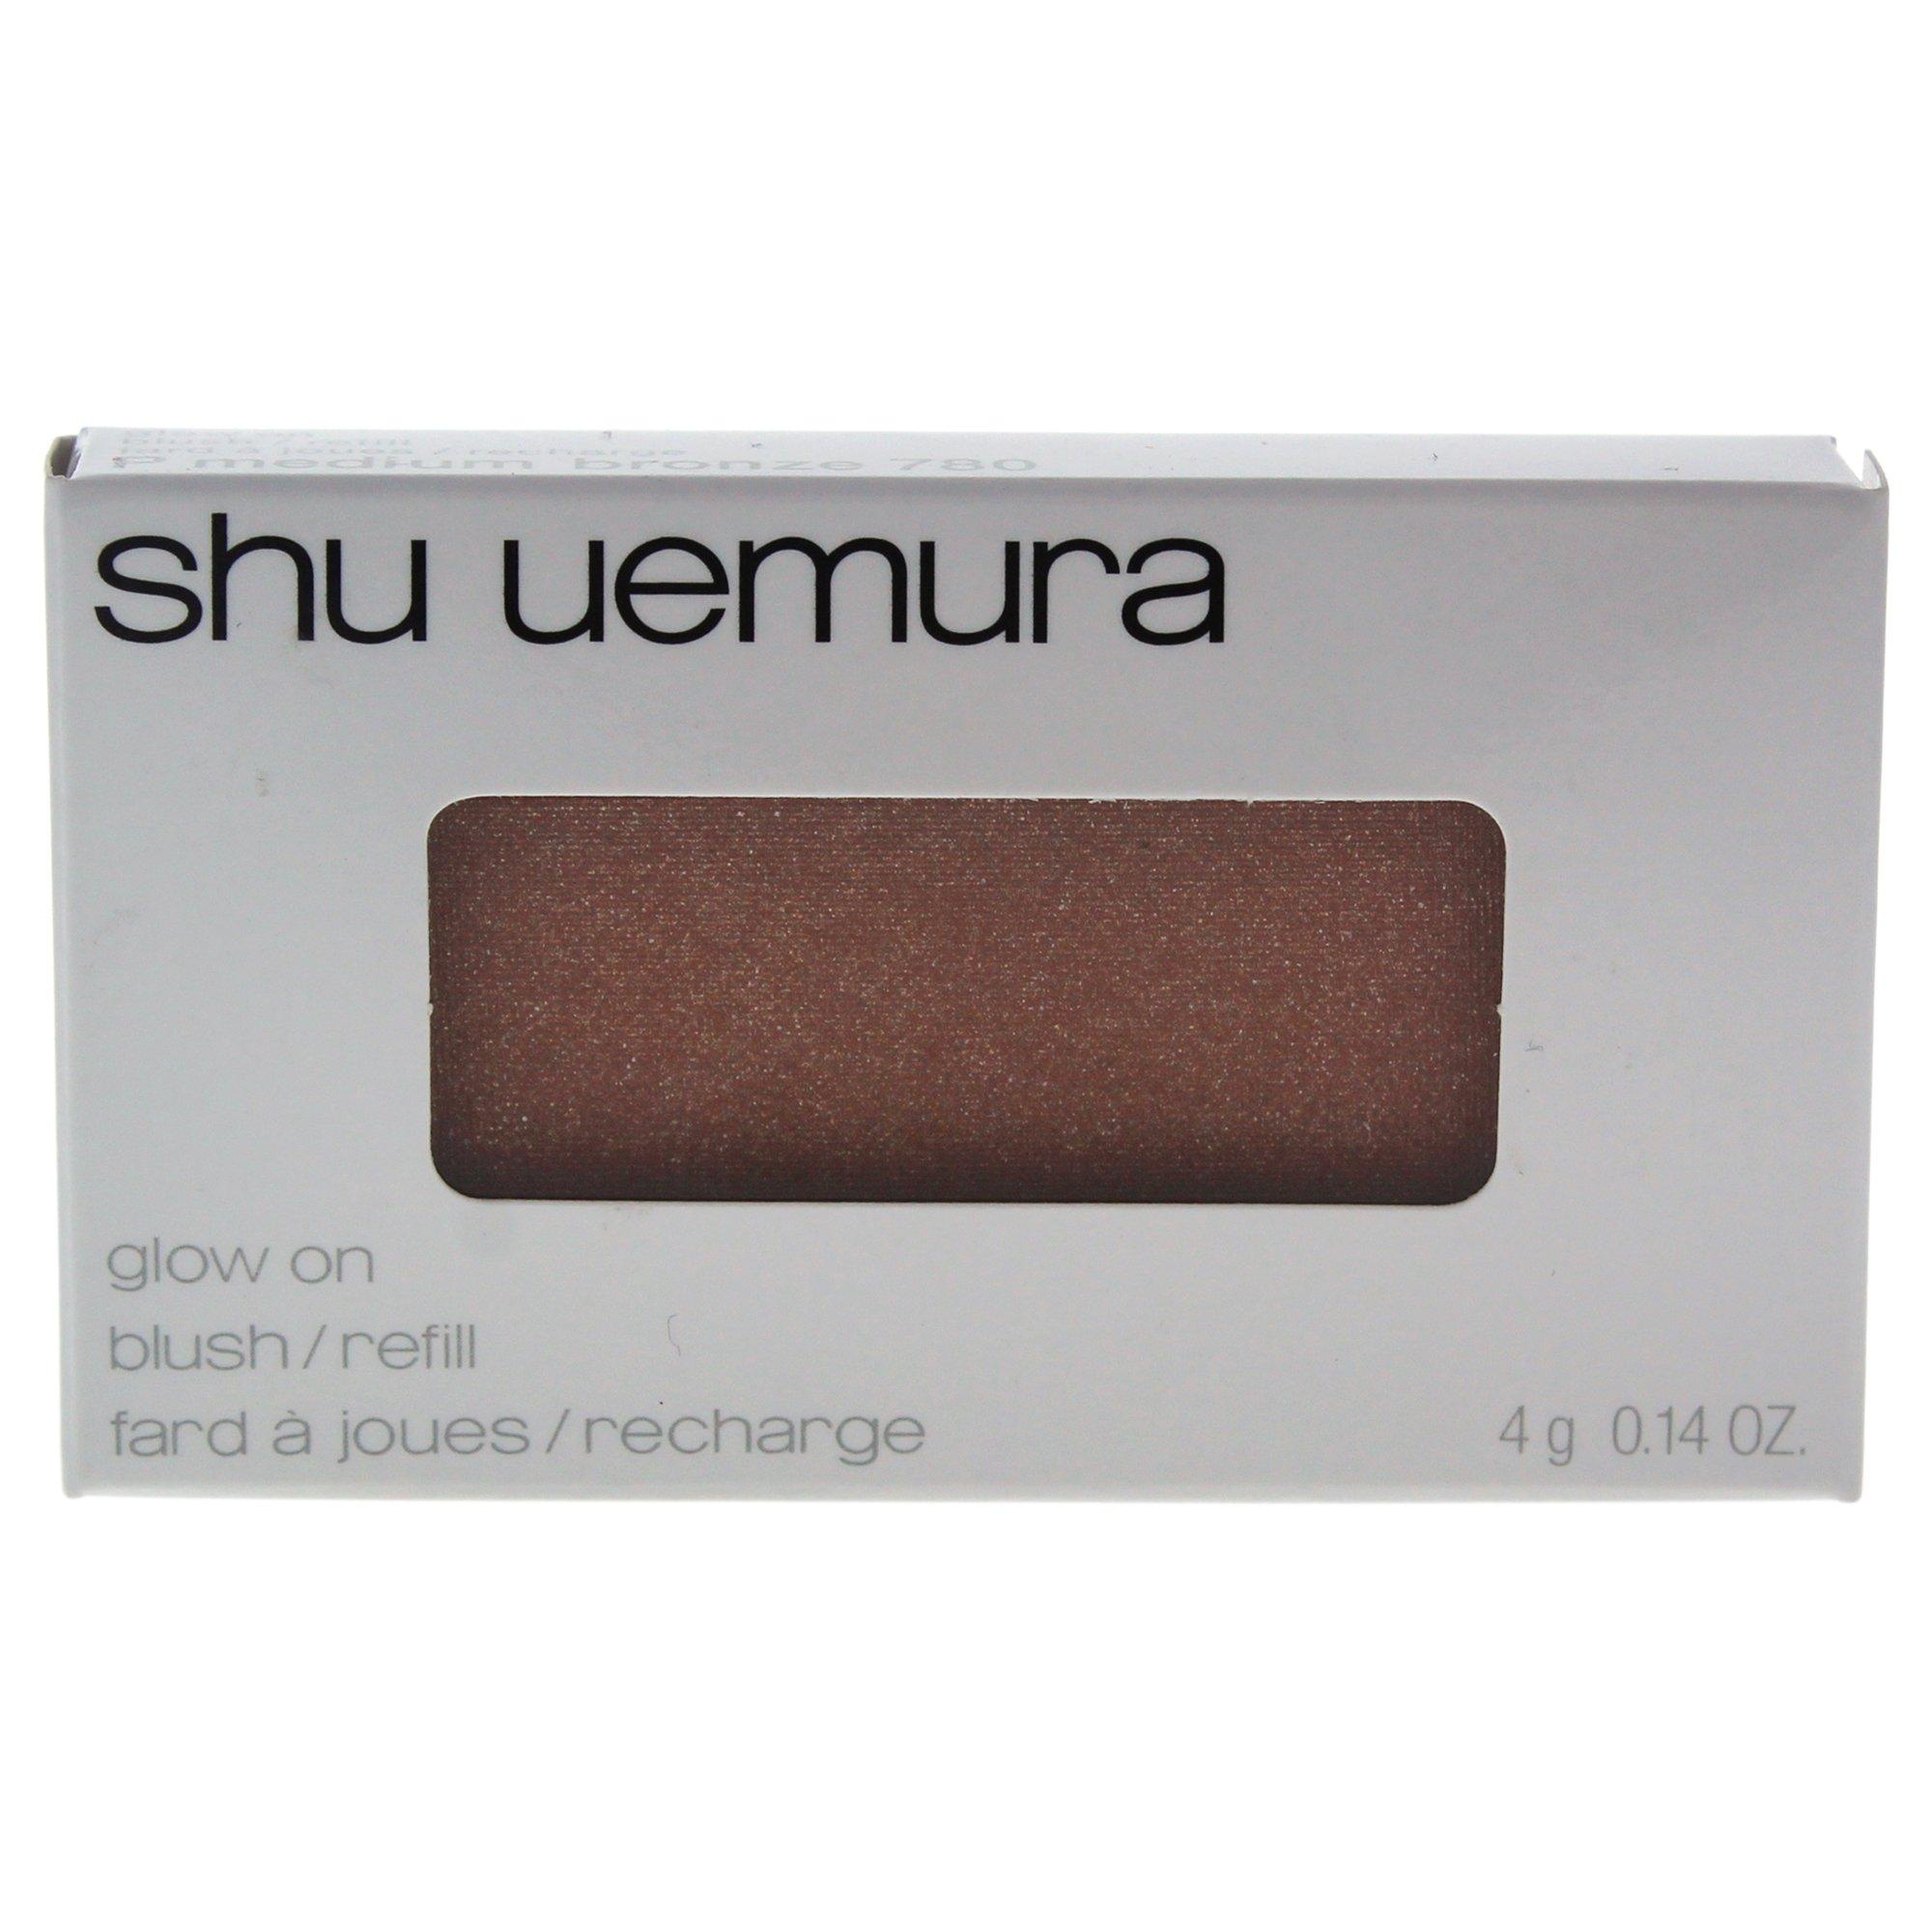 Shu Uemura Glow On Blush for Women, Medium Bronze (refill), 0.14 Ounce